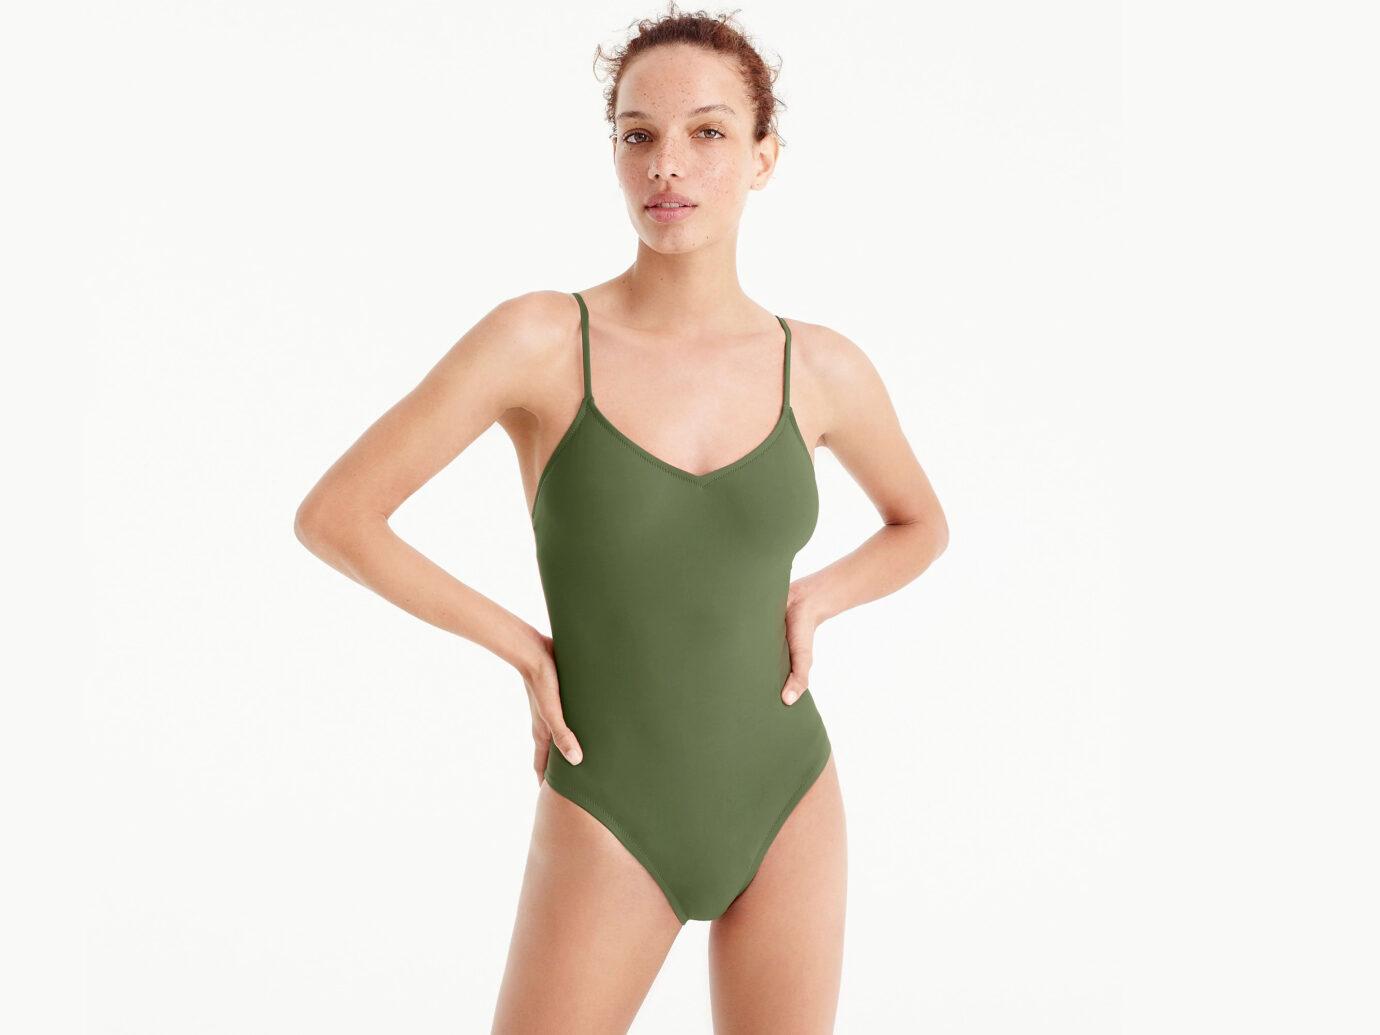 J.Crew Ballet one-piece swimsuit